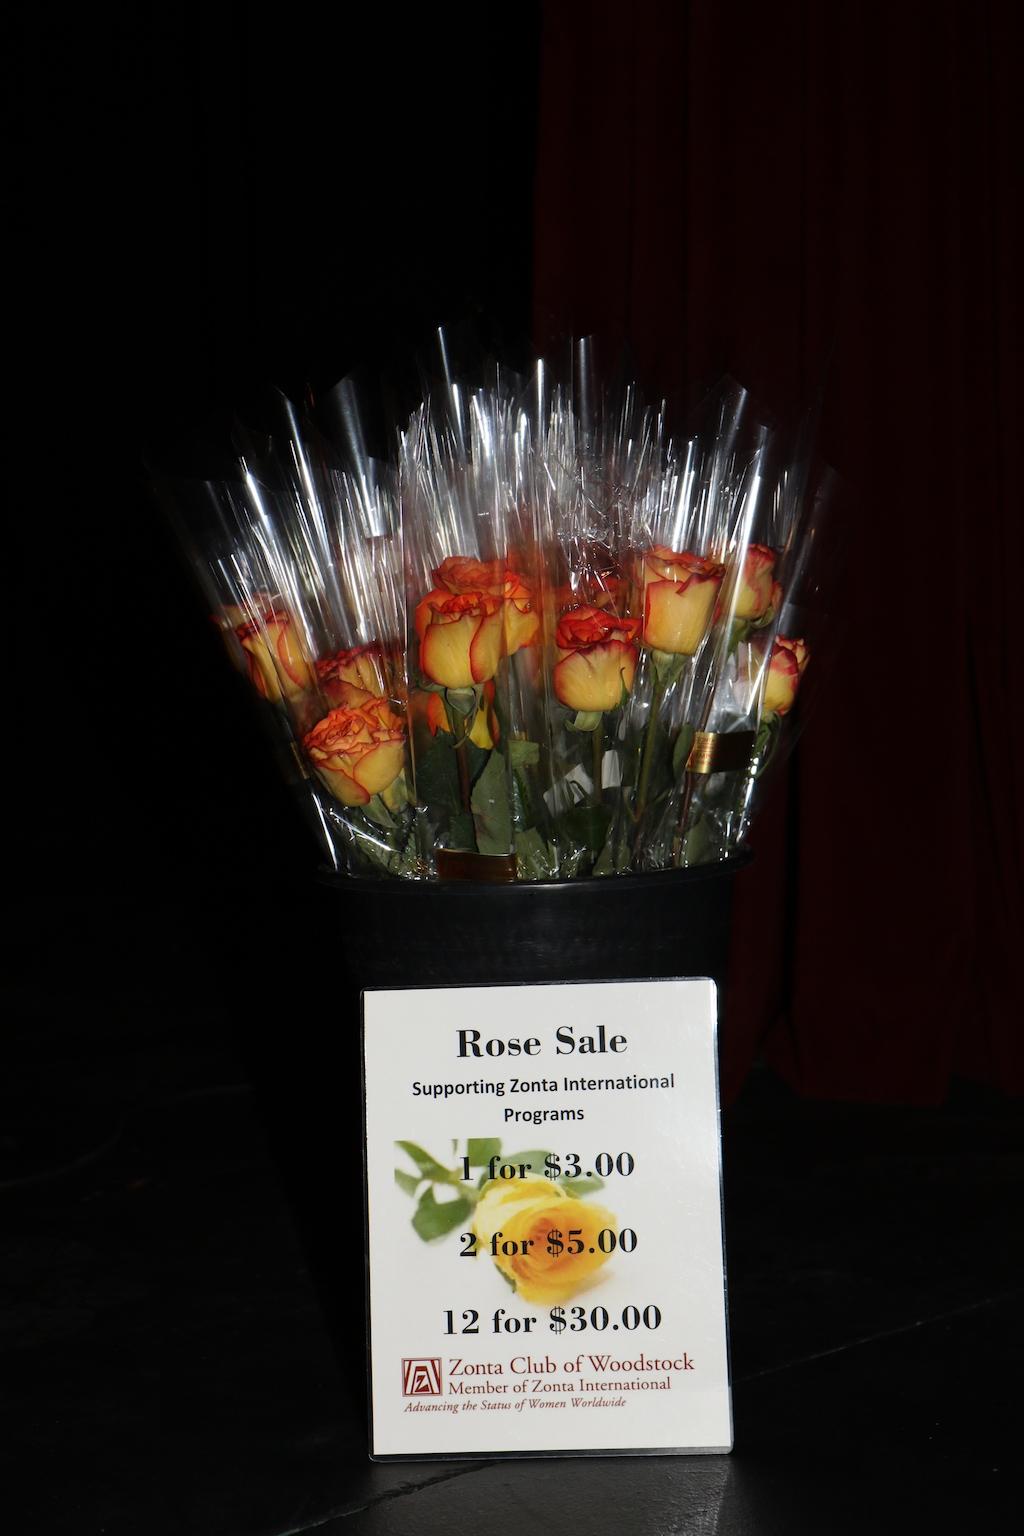 Woodstock Zonta Roses for Saling Price